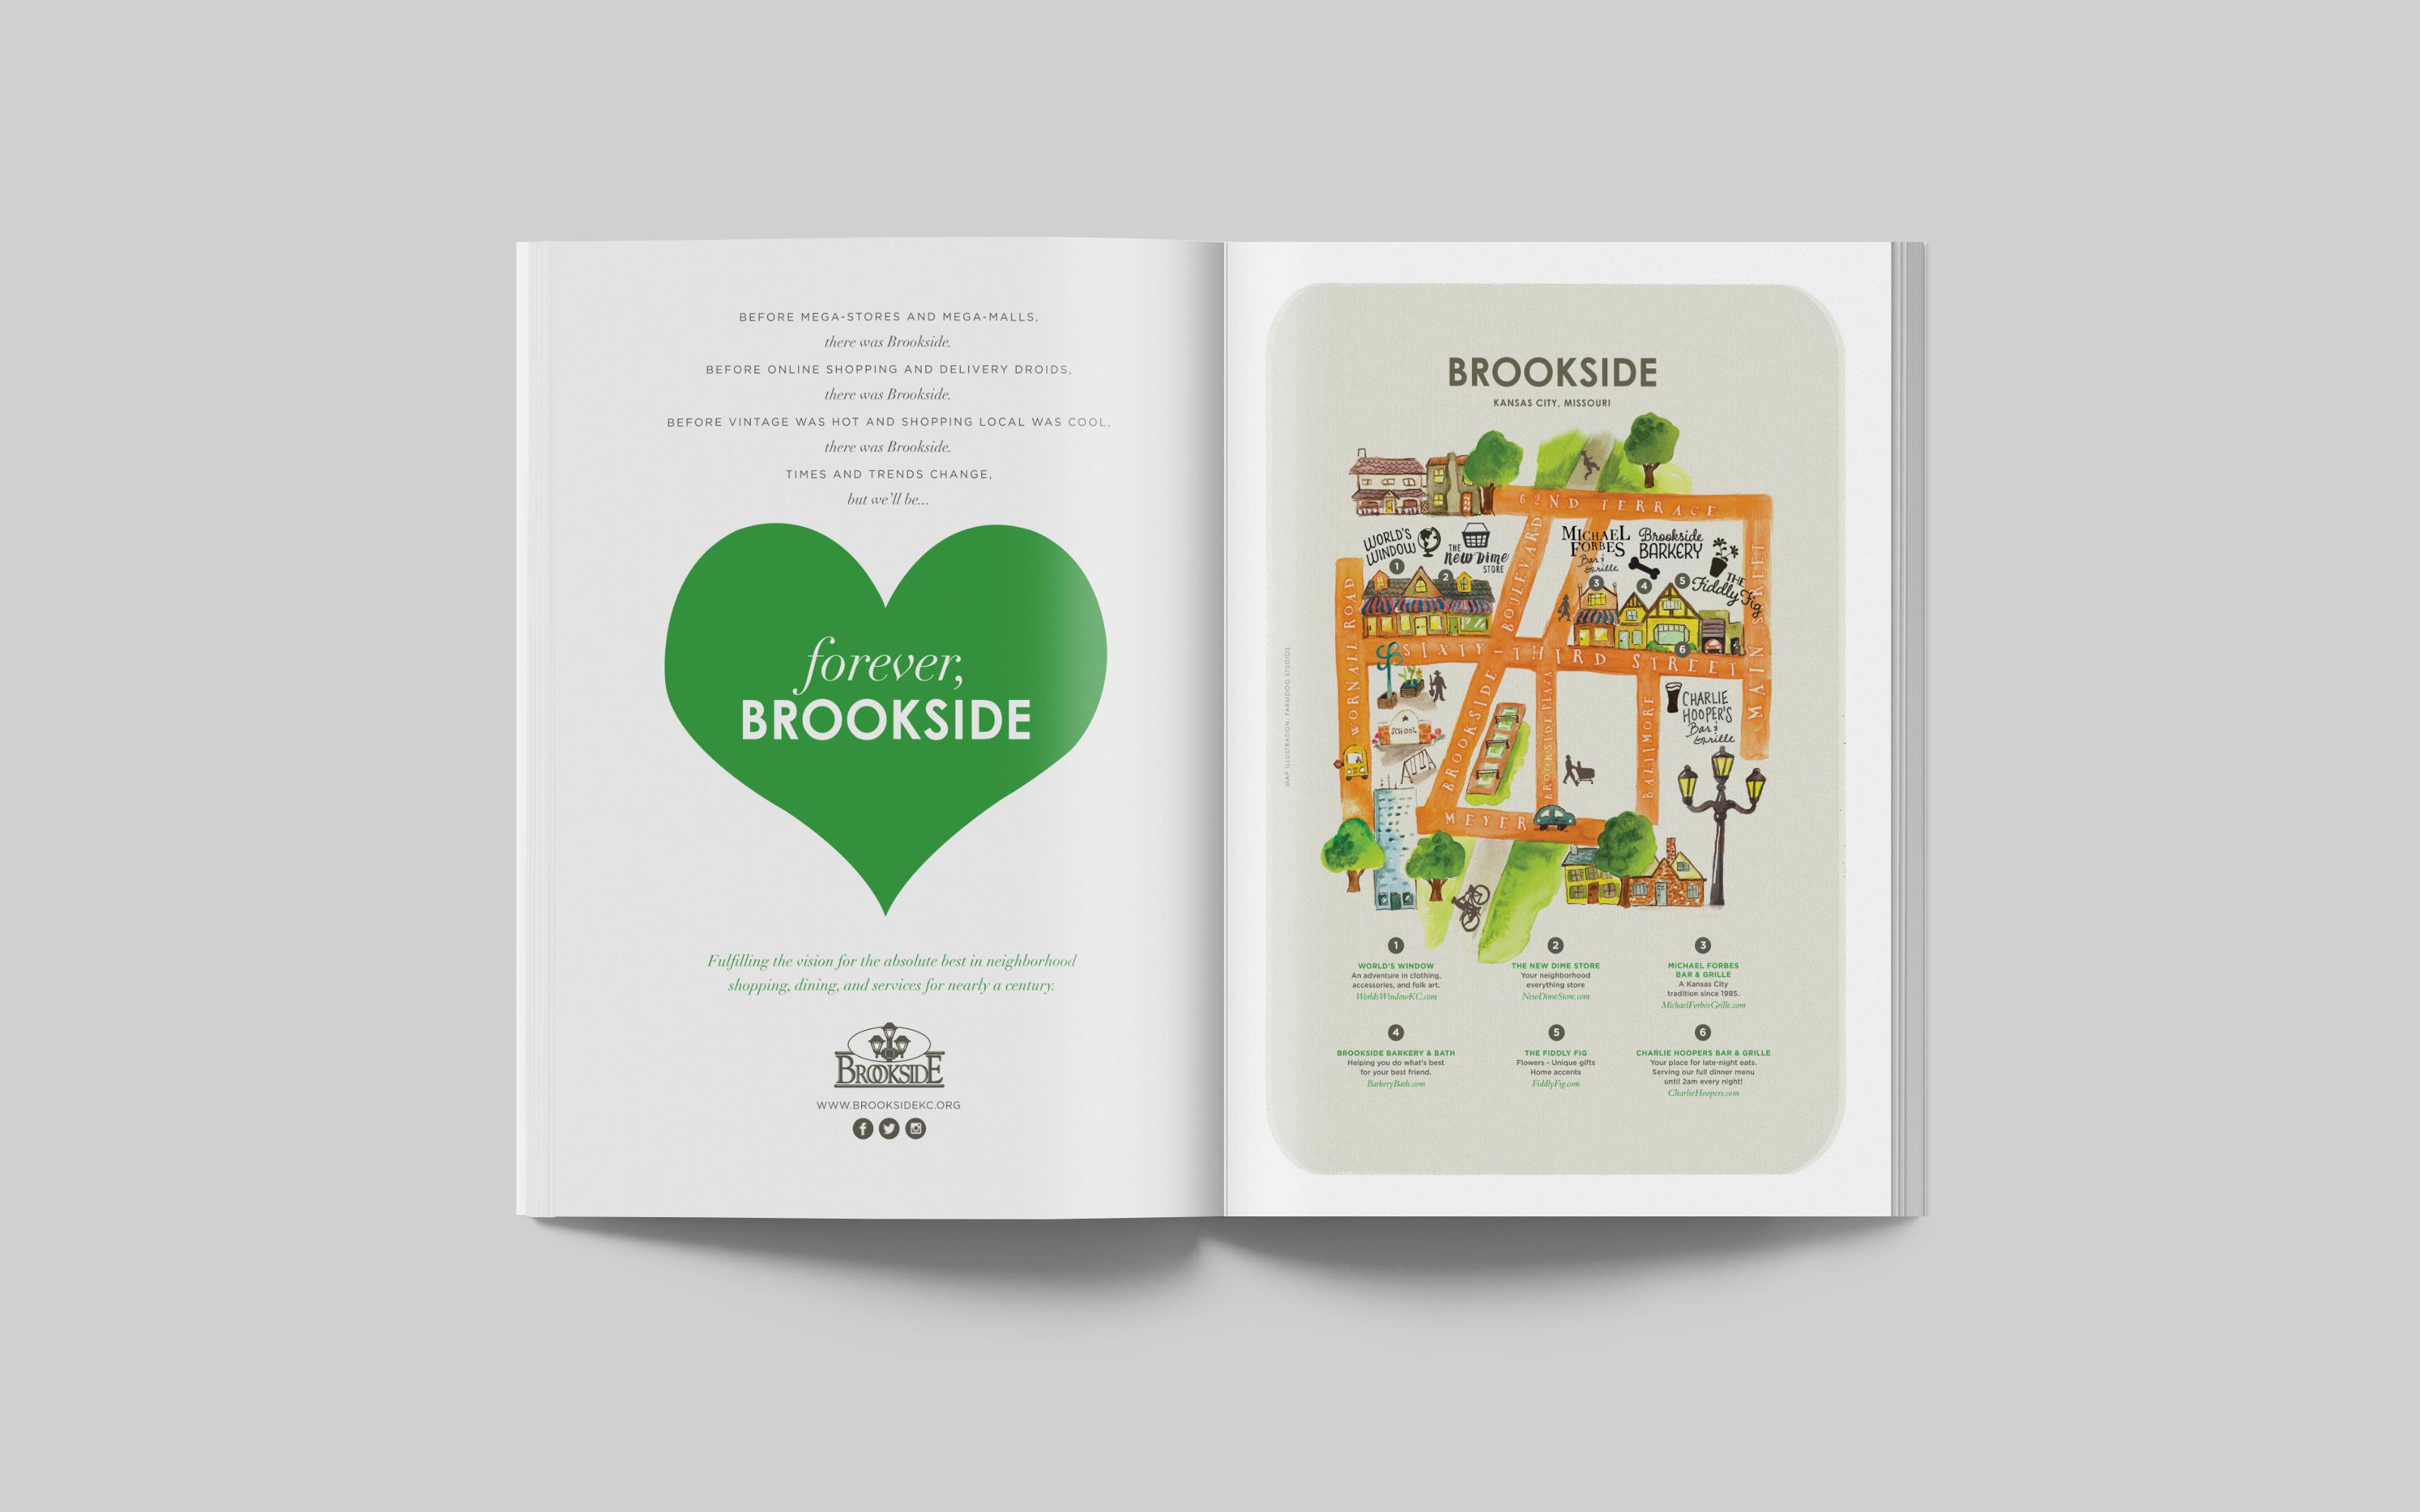 Forever, Brookside